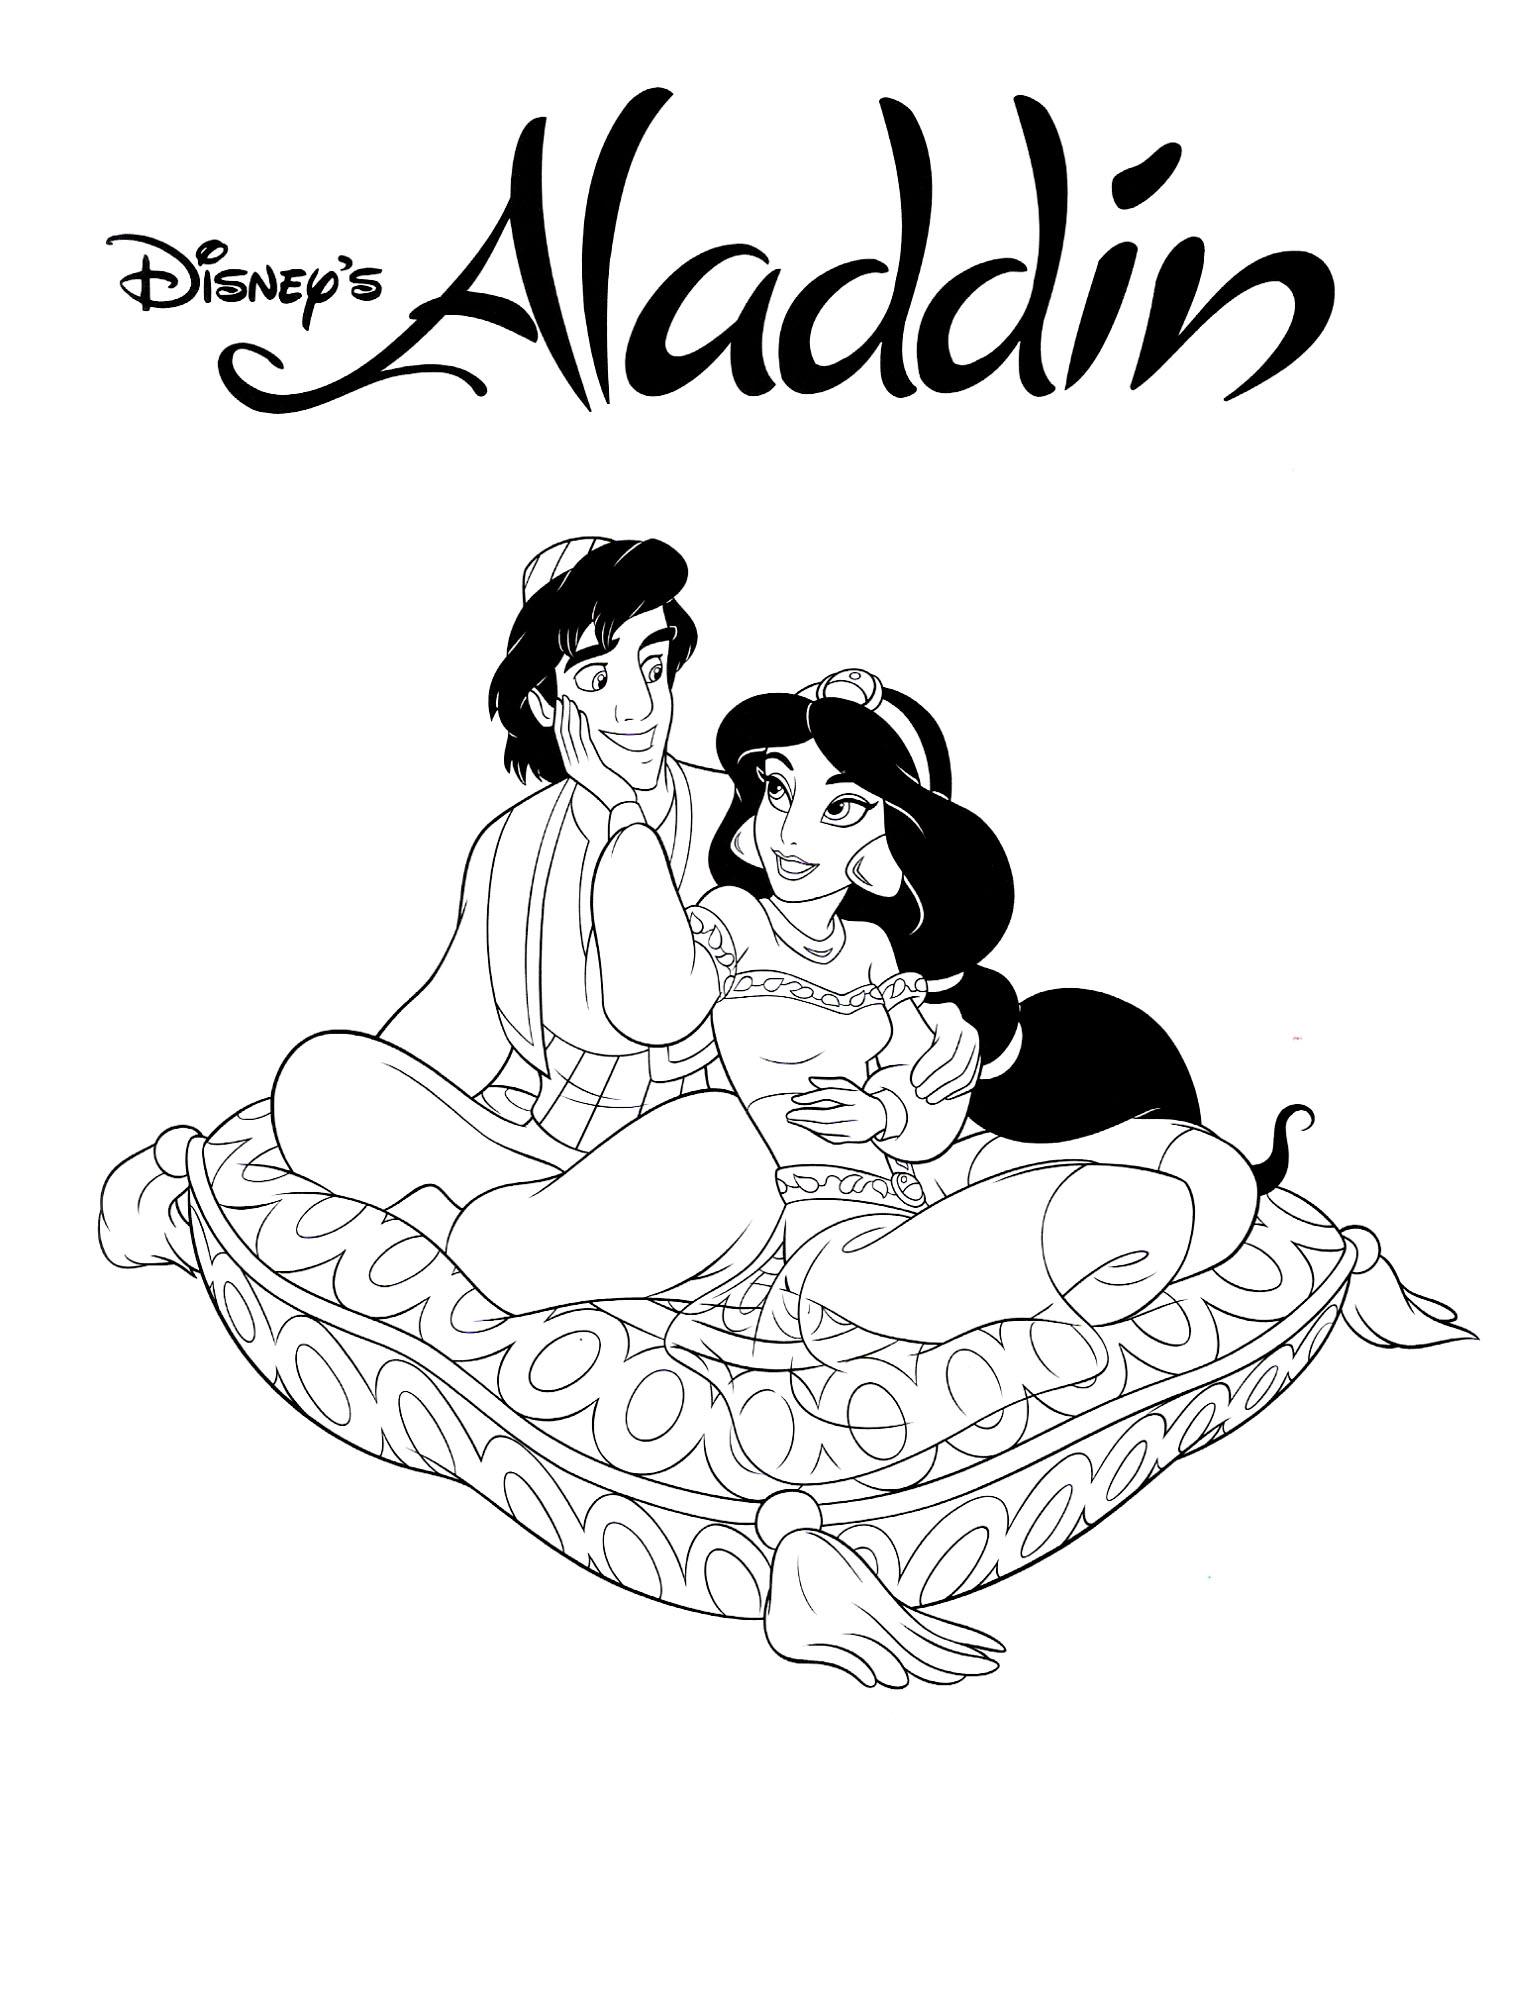 Coloriage Aladdin Disney À Imprimer à Dessin Walt Disney À Imprimer